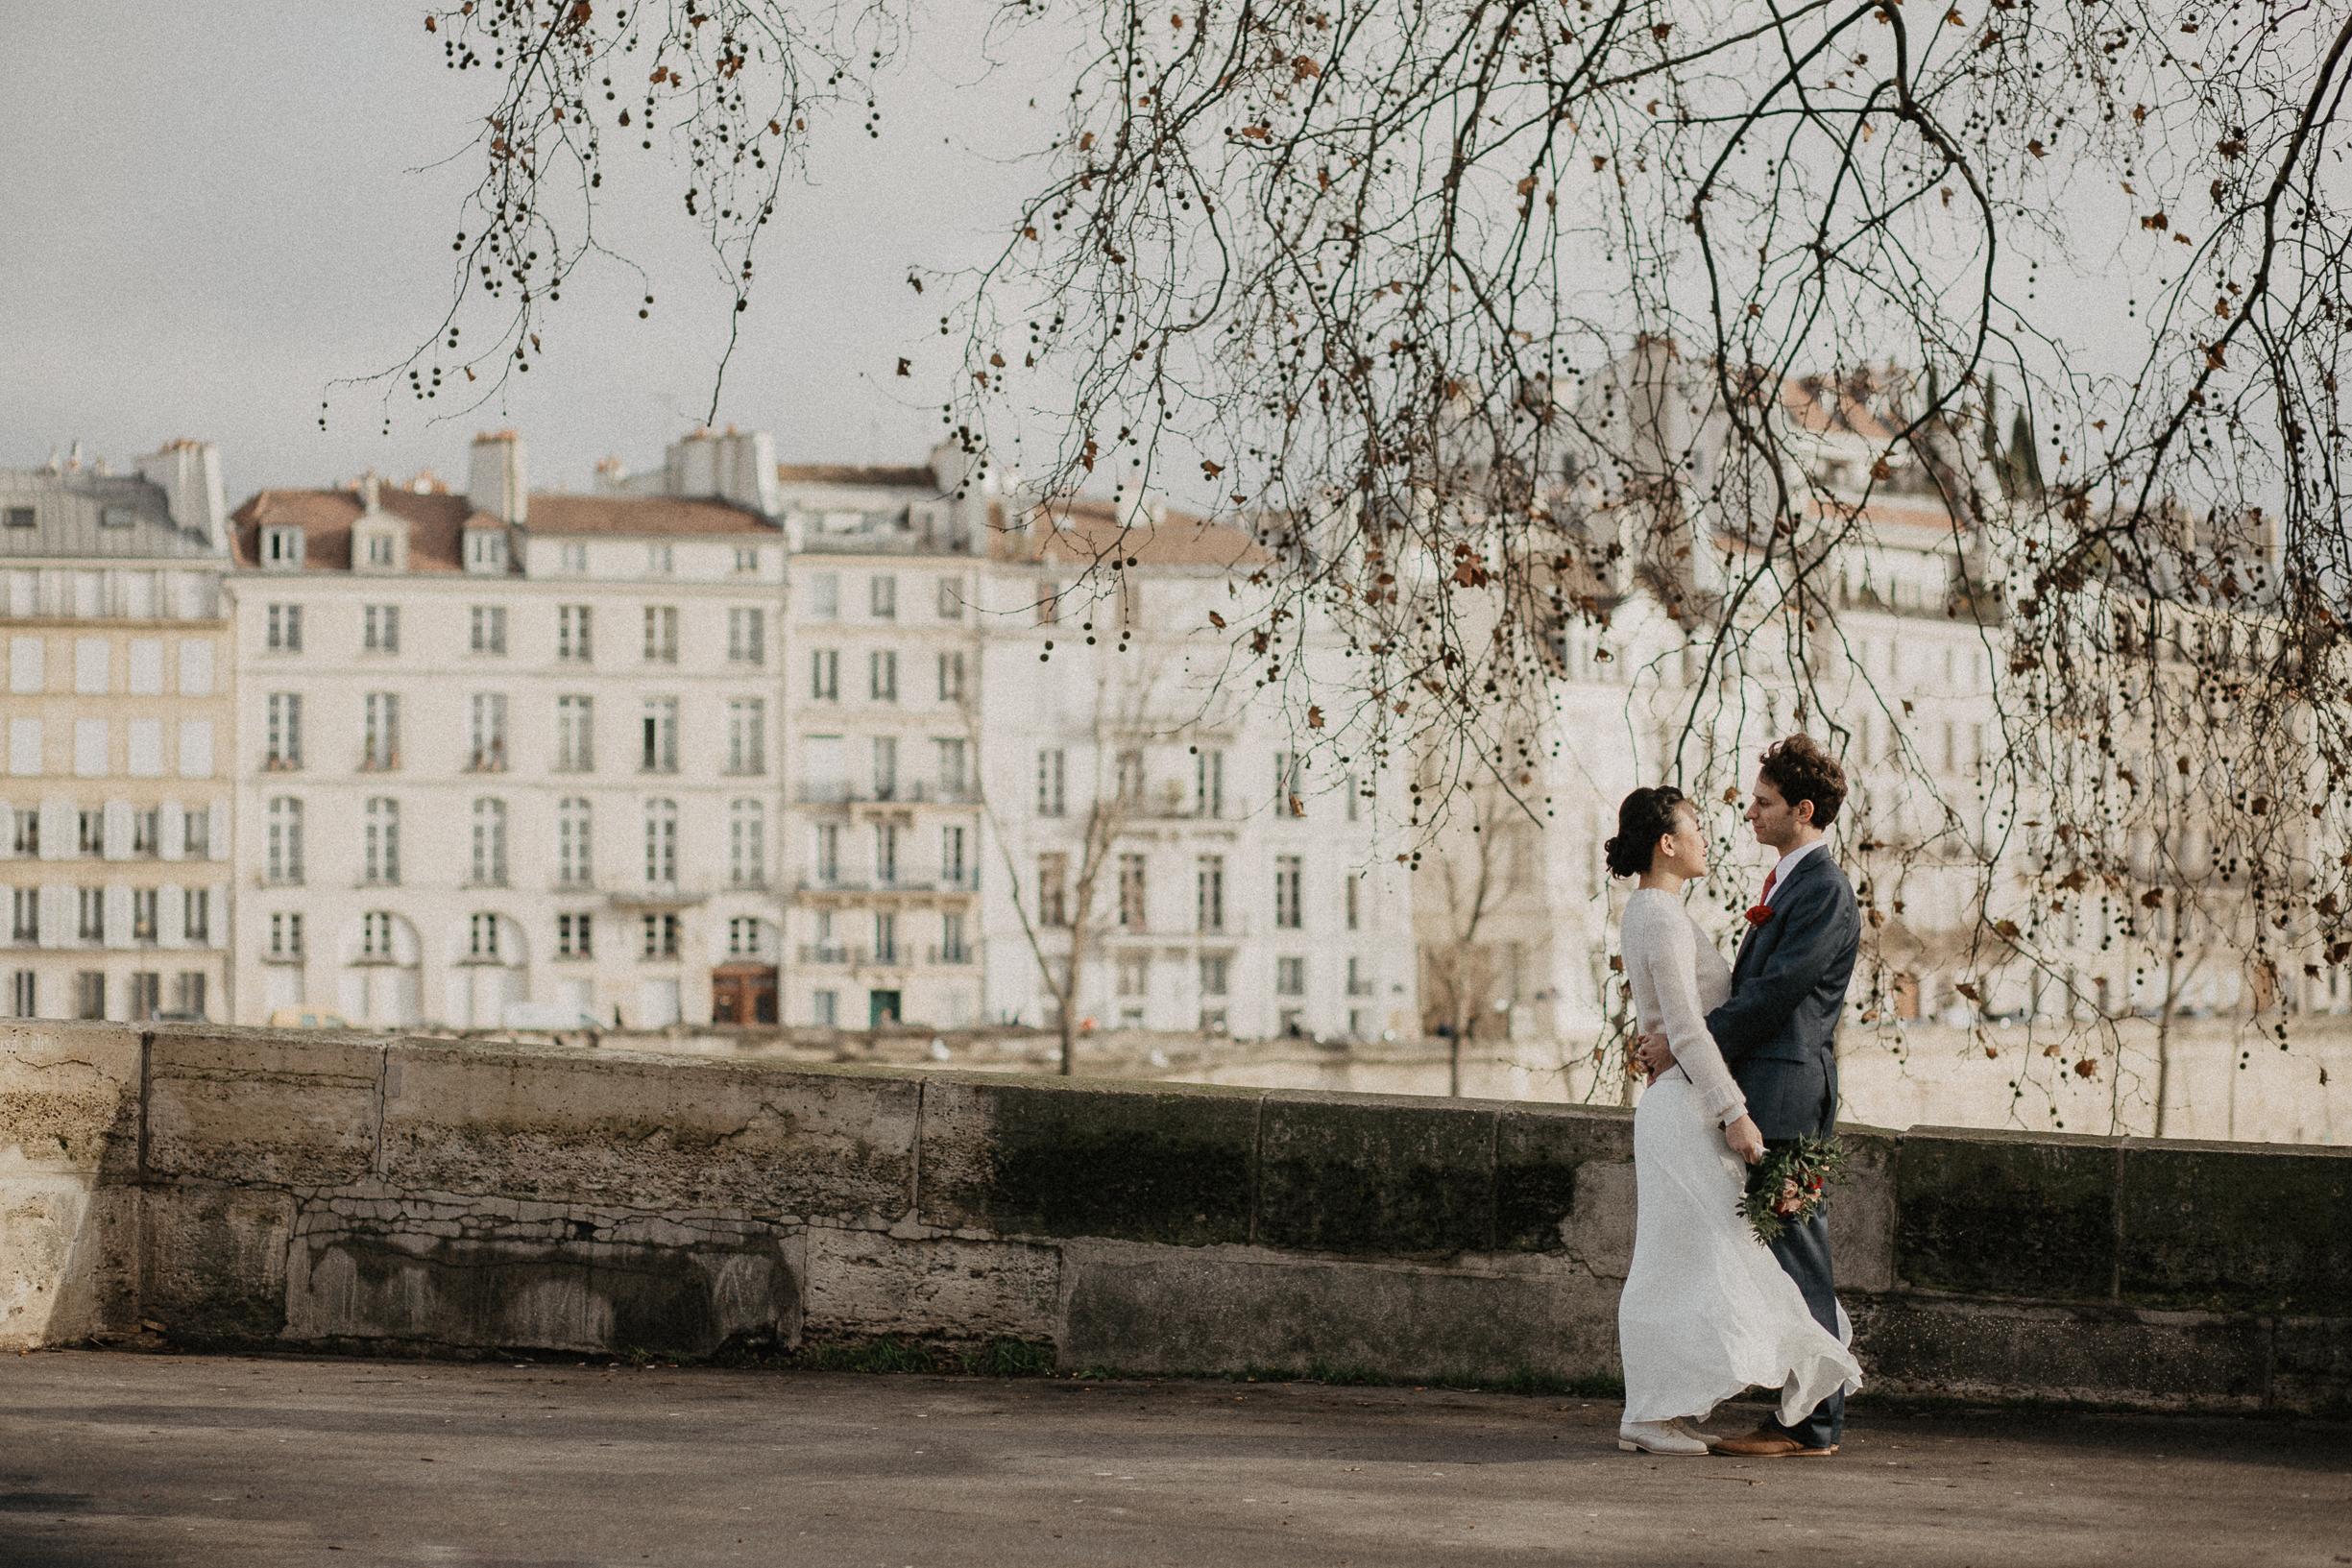 A winter wedding in Paris